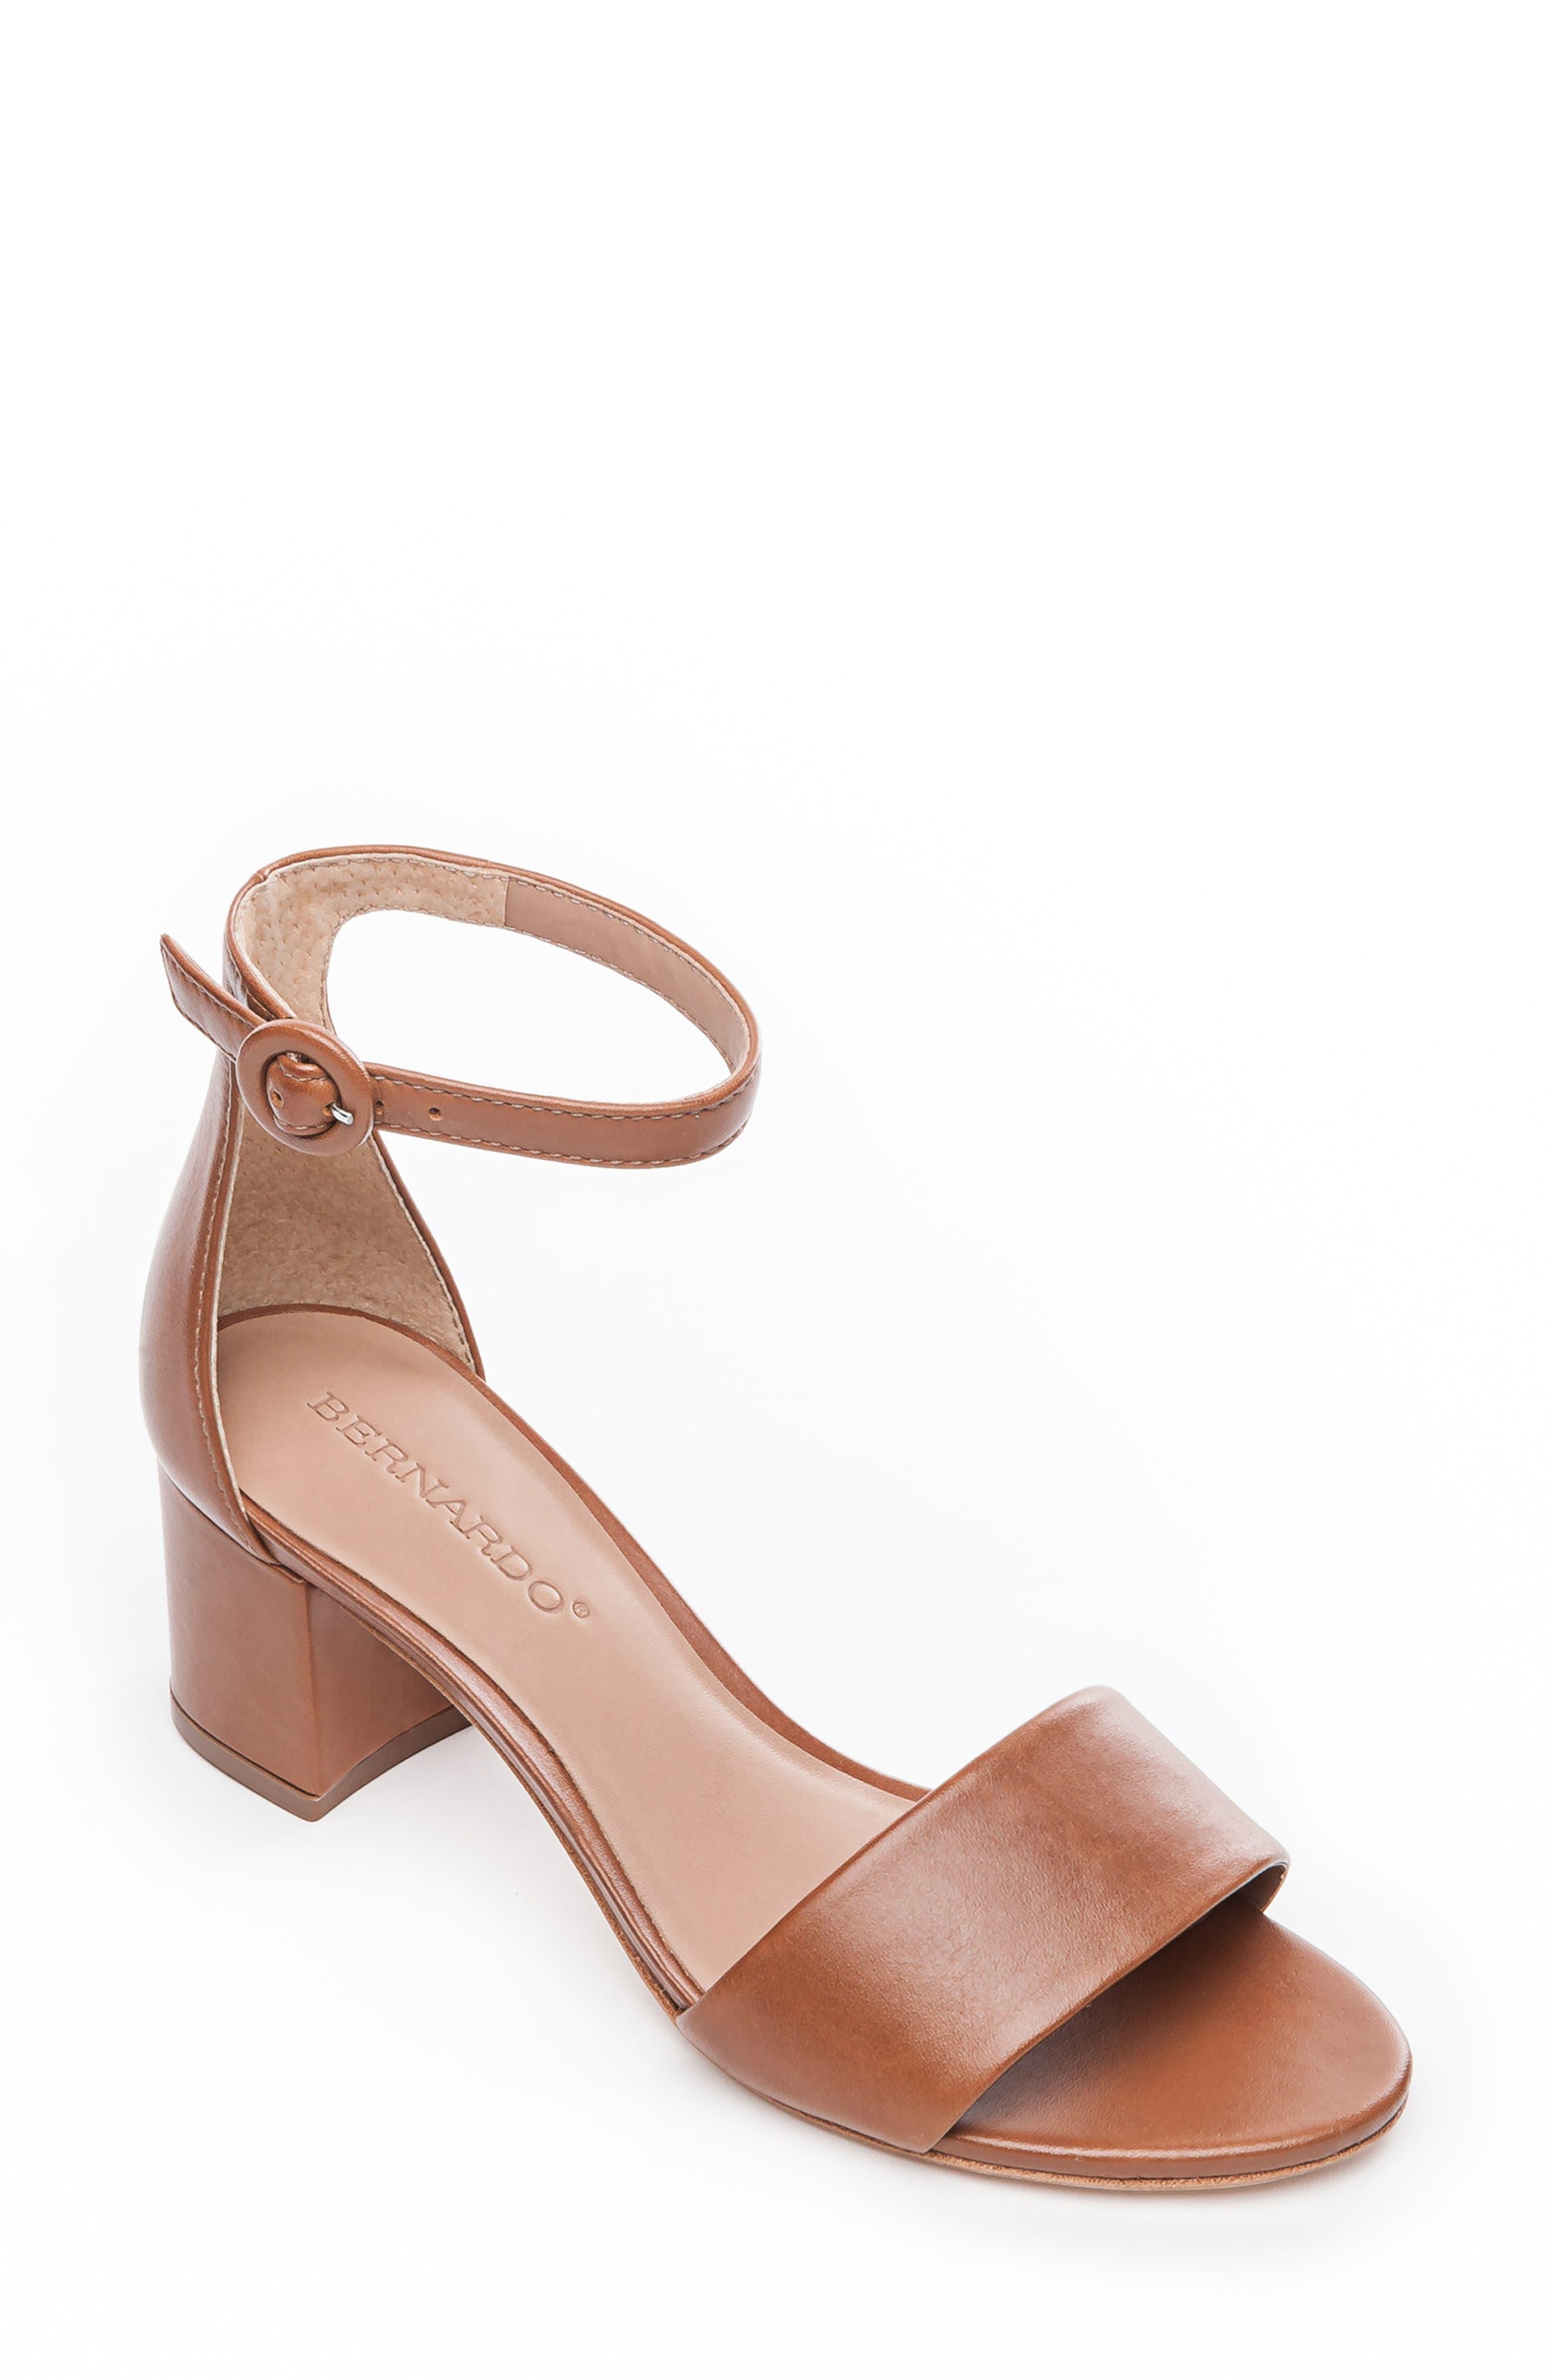 98aa8cb99a0 Bernardo Belinda Ankle Strap Sandal